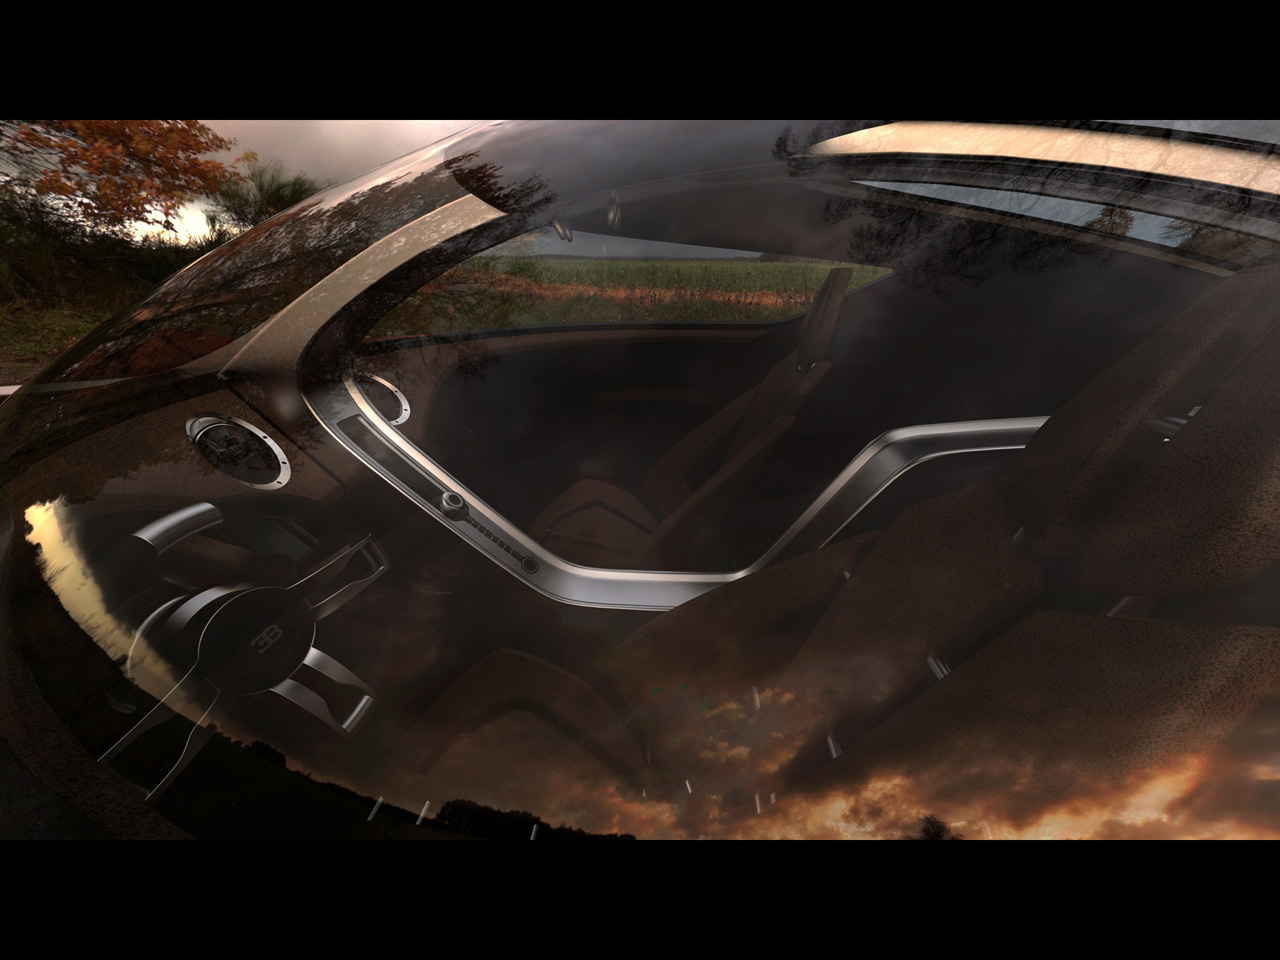 http://3.bp.blogspot.com/-TH3kKKufVSc/URg7IgF4i9I/AAAAAAAAAIQ/L00nV0BOUgM/s1600/2025-Bugatti-Aerolithe-Concept-Design-by-Douglas-Hogg-Interior-1280x960.jpg